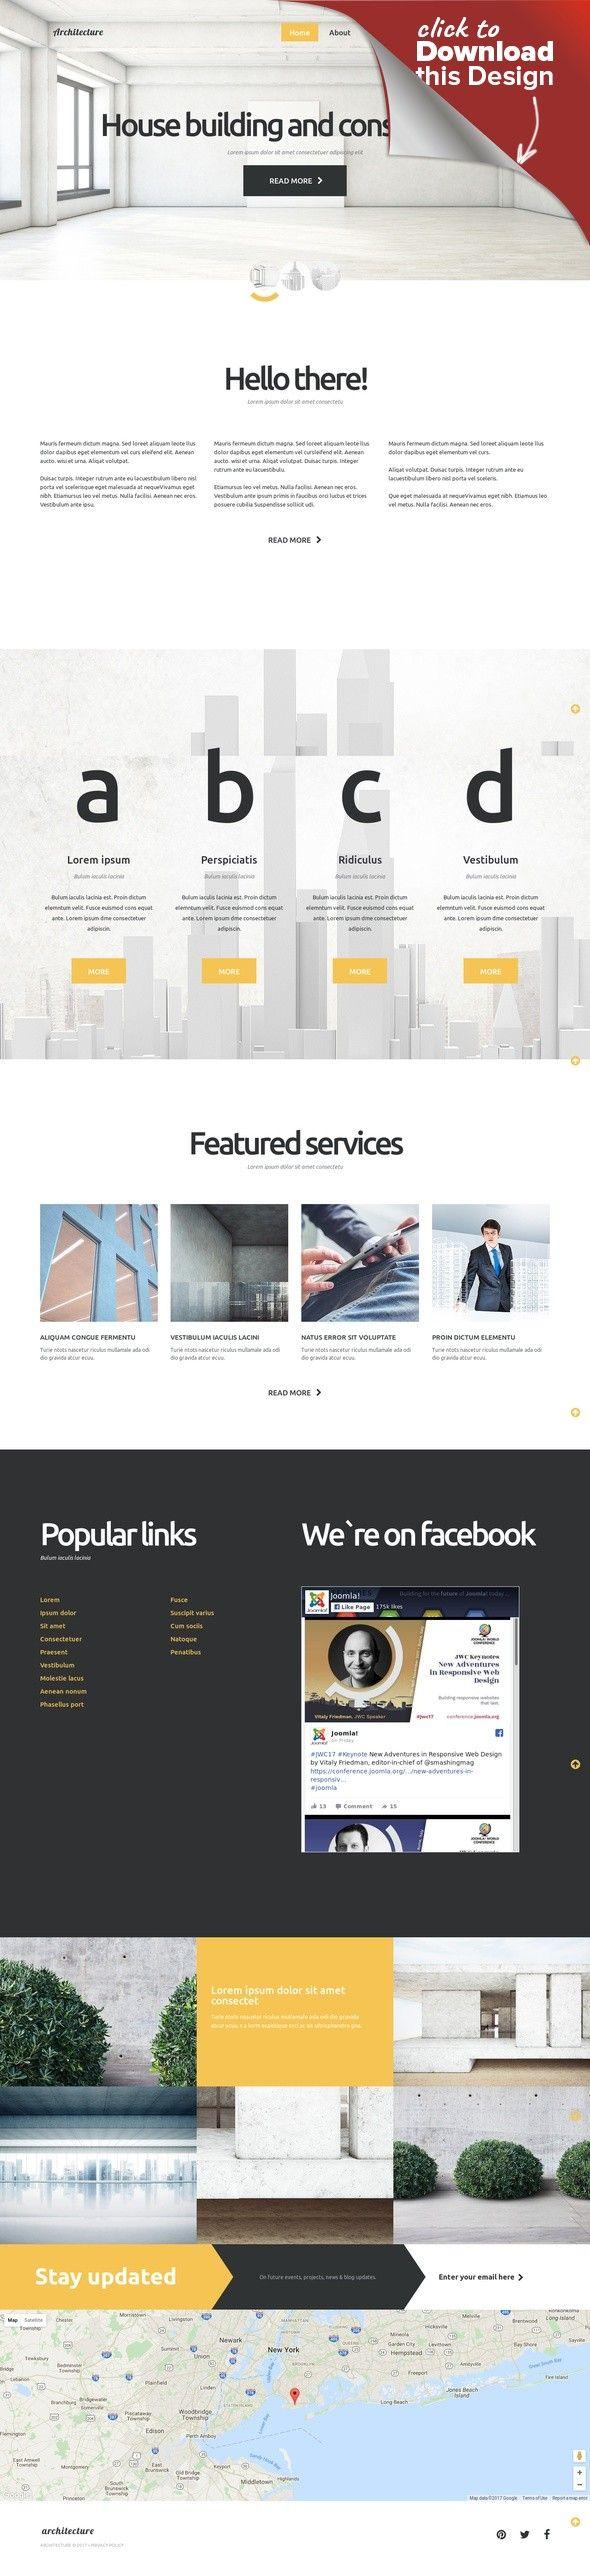 Architecture Joomla Template CMS & Blog Templates, Joomla Templates, Design & Photography, Design, Architecture